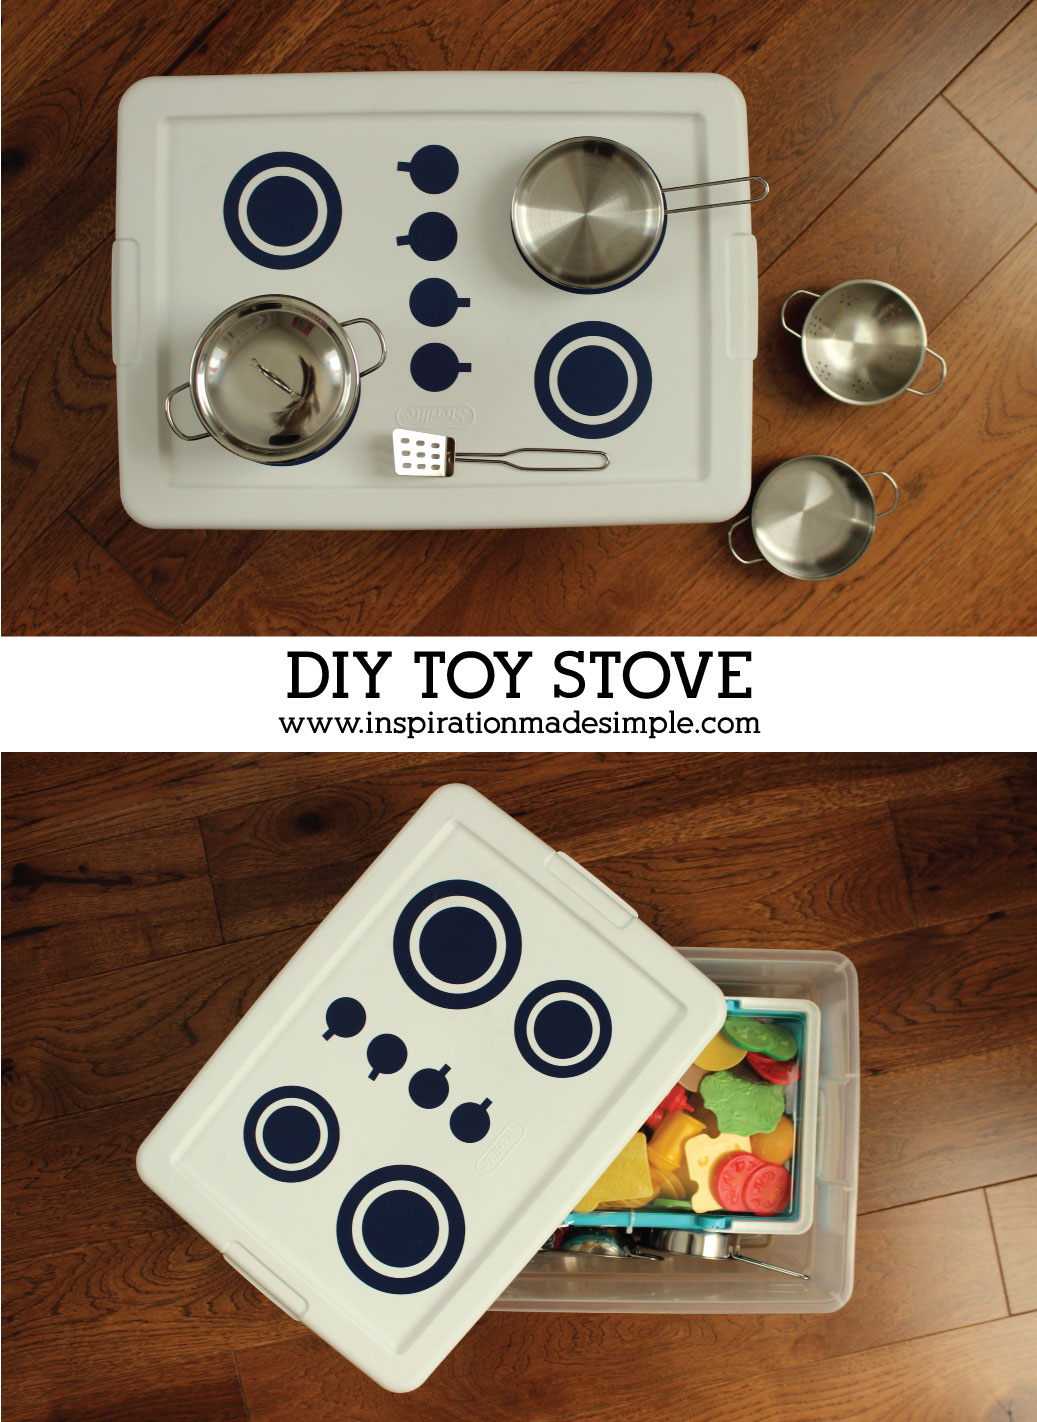 DIY Play Tote Stove